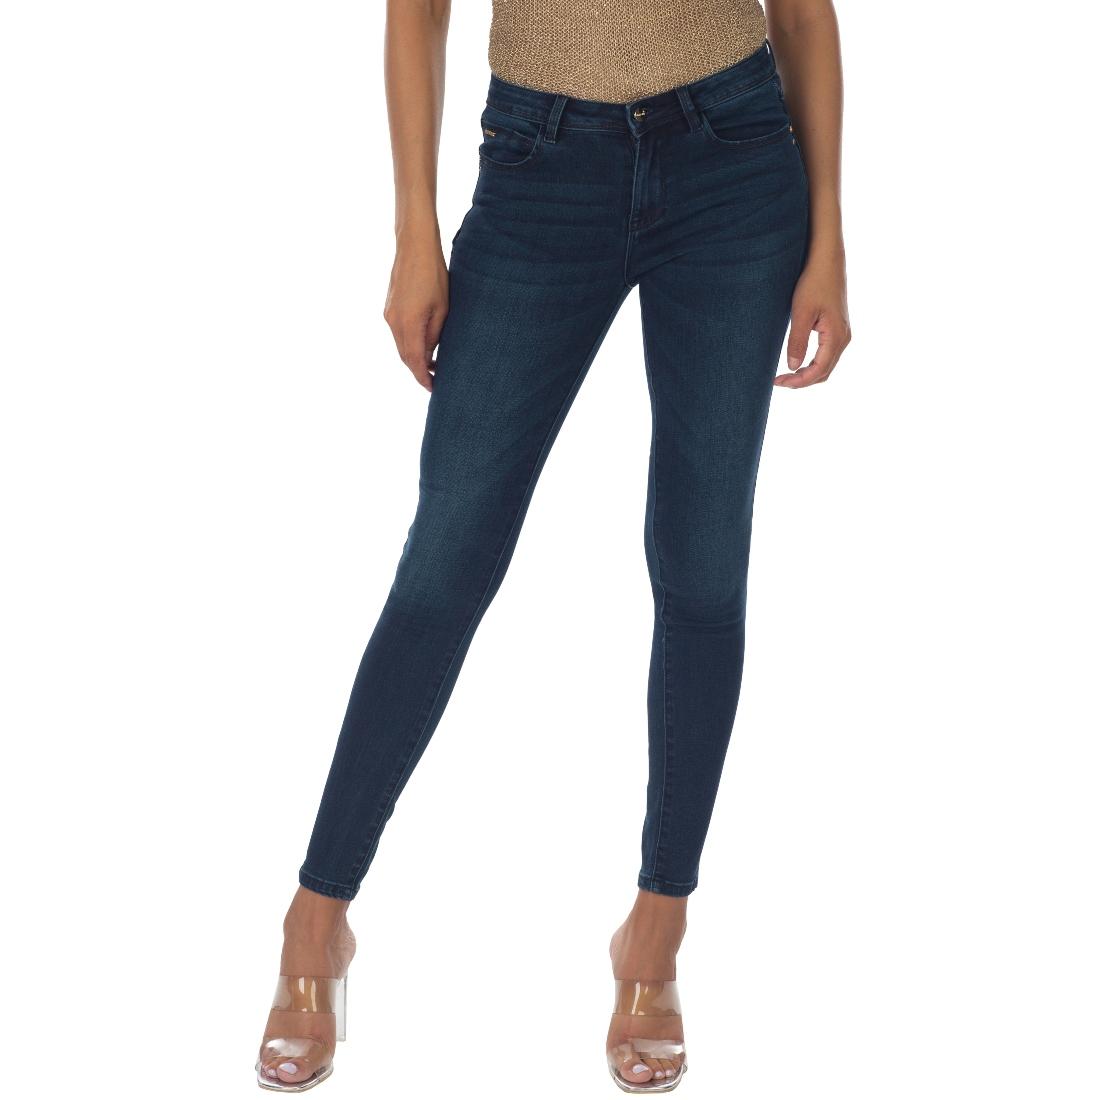 SISSYBOY fast track low waist skinny jeans 2